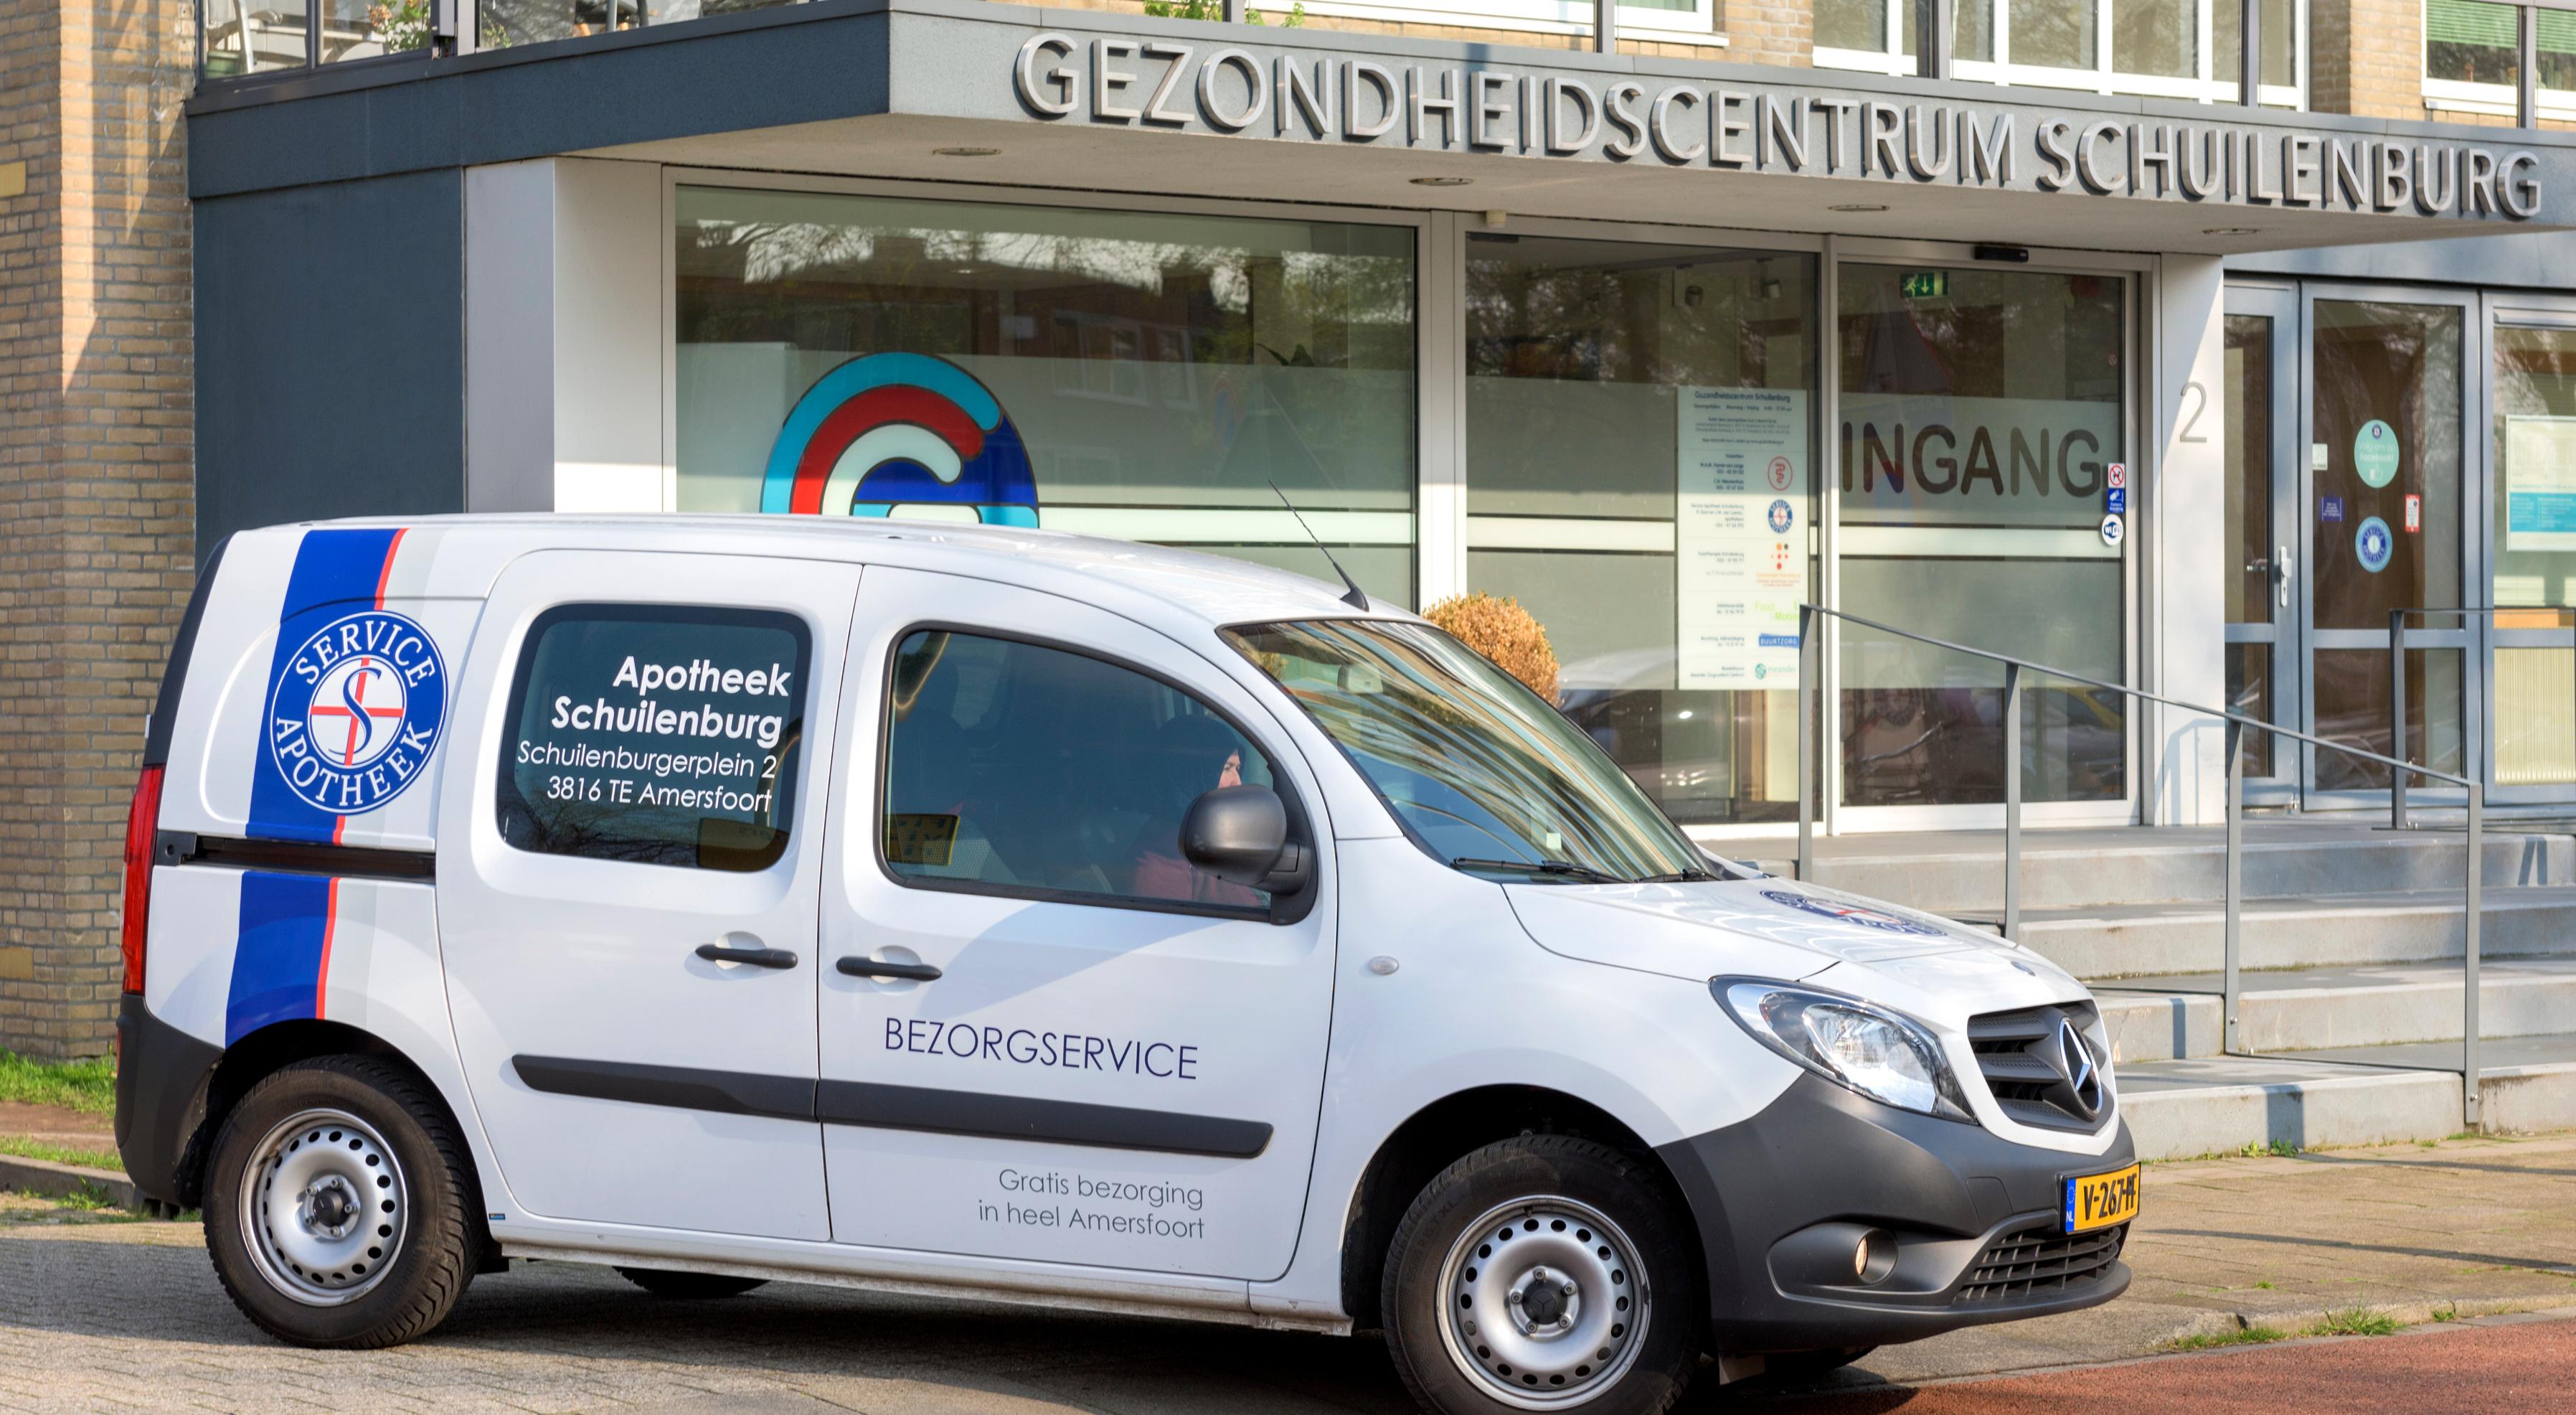 Service Apotheek Schuilenburg